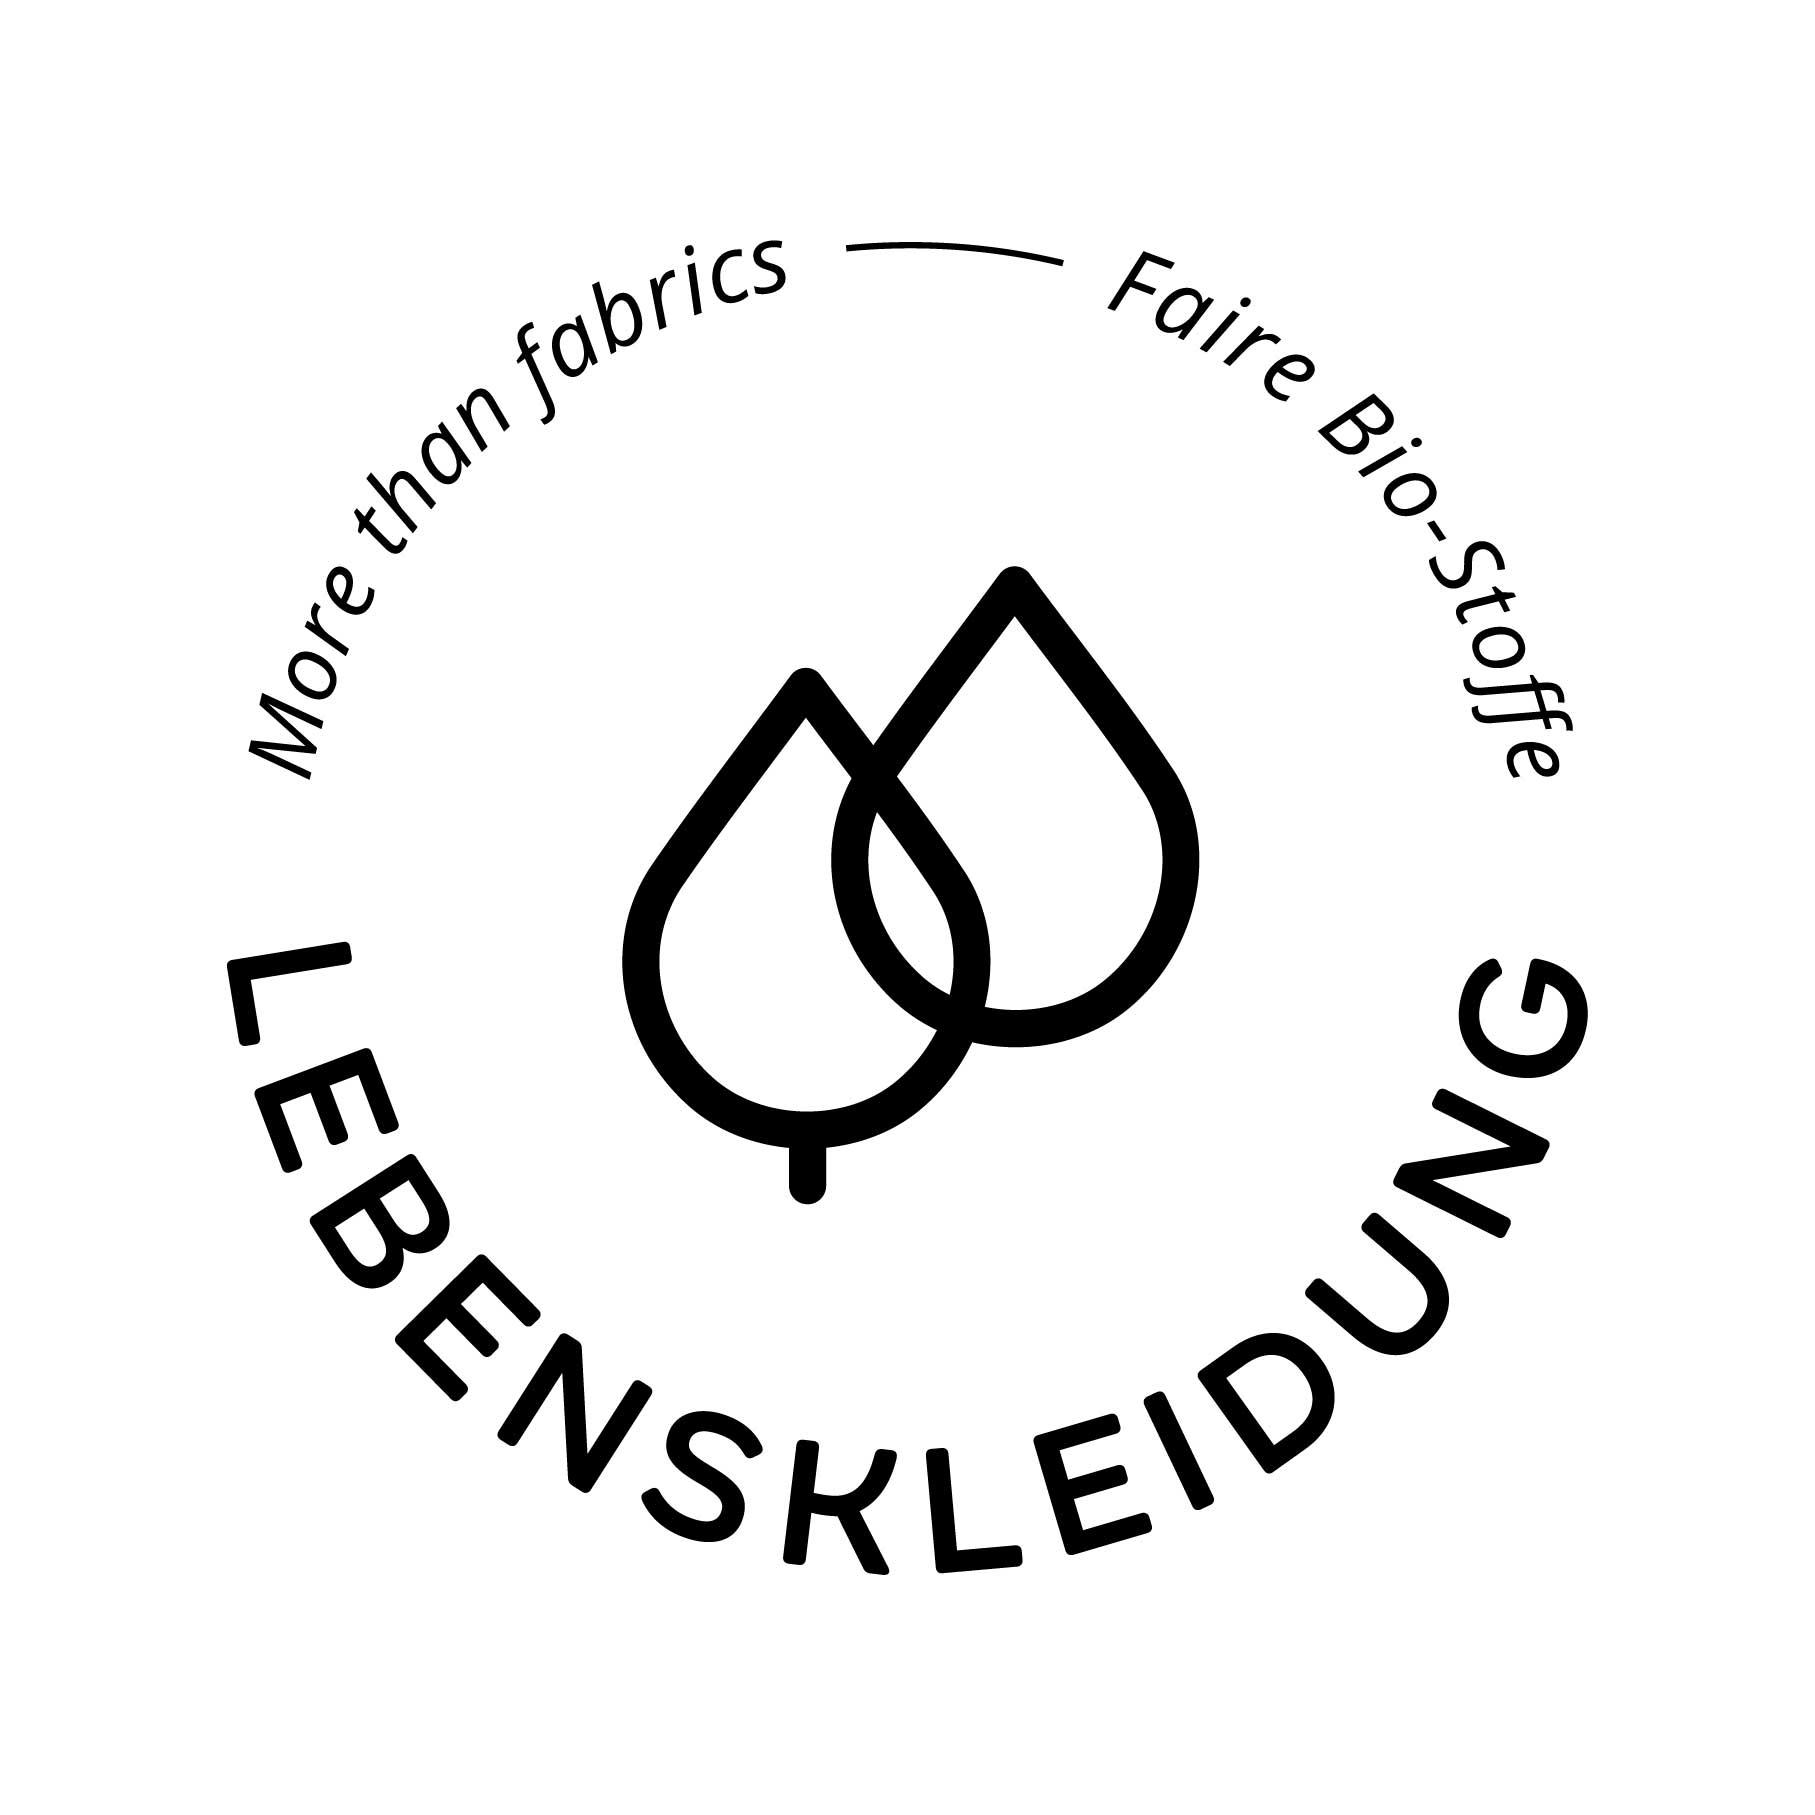 Tela orgánica Banda de goma elástica - 59% Bio Baumwolle 41% Naturkautschuk -  adecuado para telas de peso ligero a medio - 9,5 mm -  Ecru  - 100 Metros-1